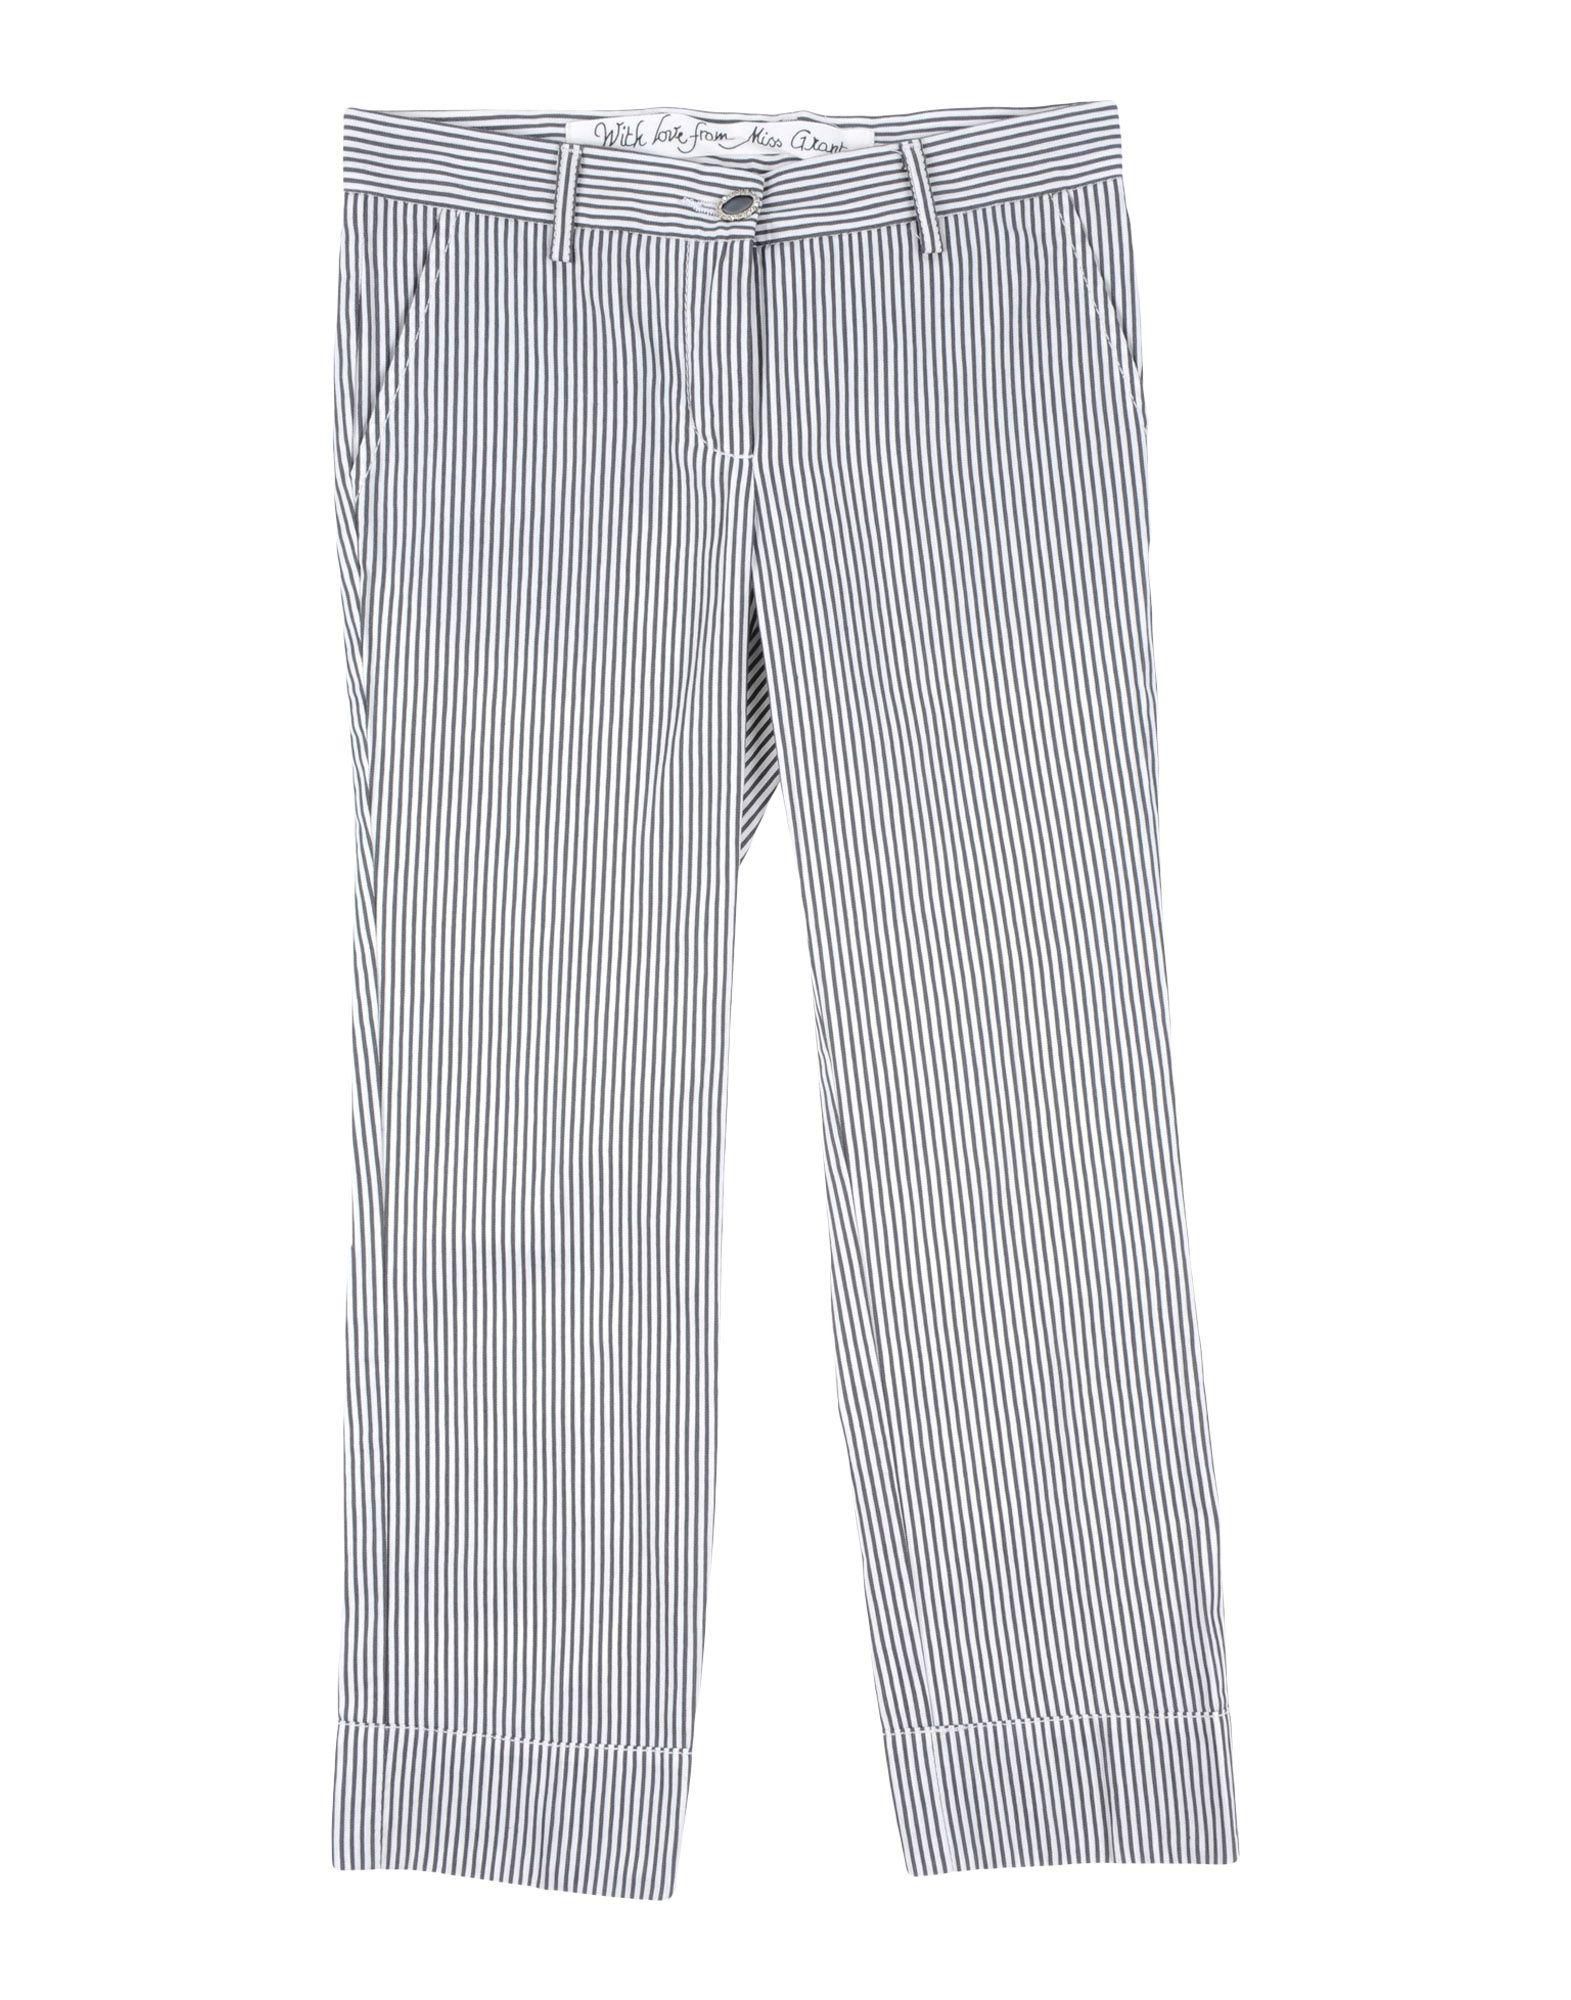 MISS GRANT Повседневные брюки miss grant топ miss grant 2756 6861 белый голубой